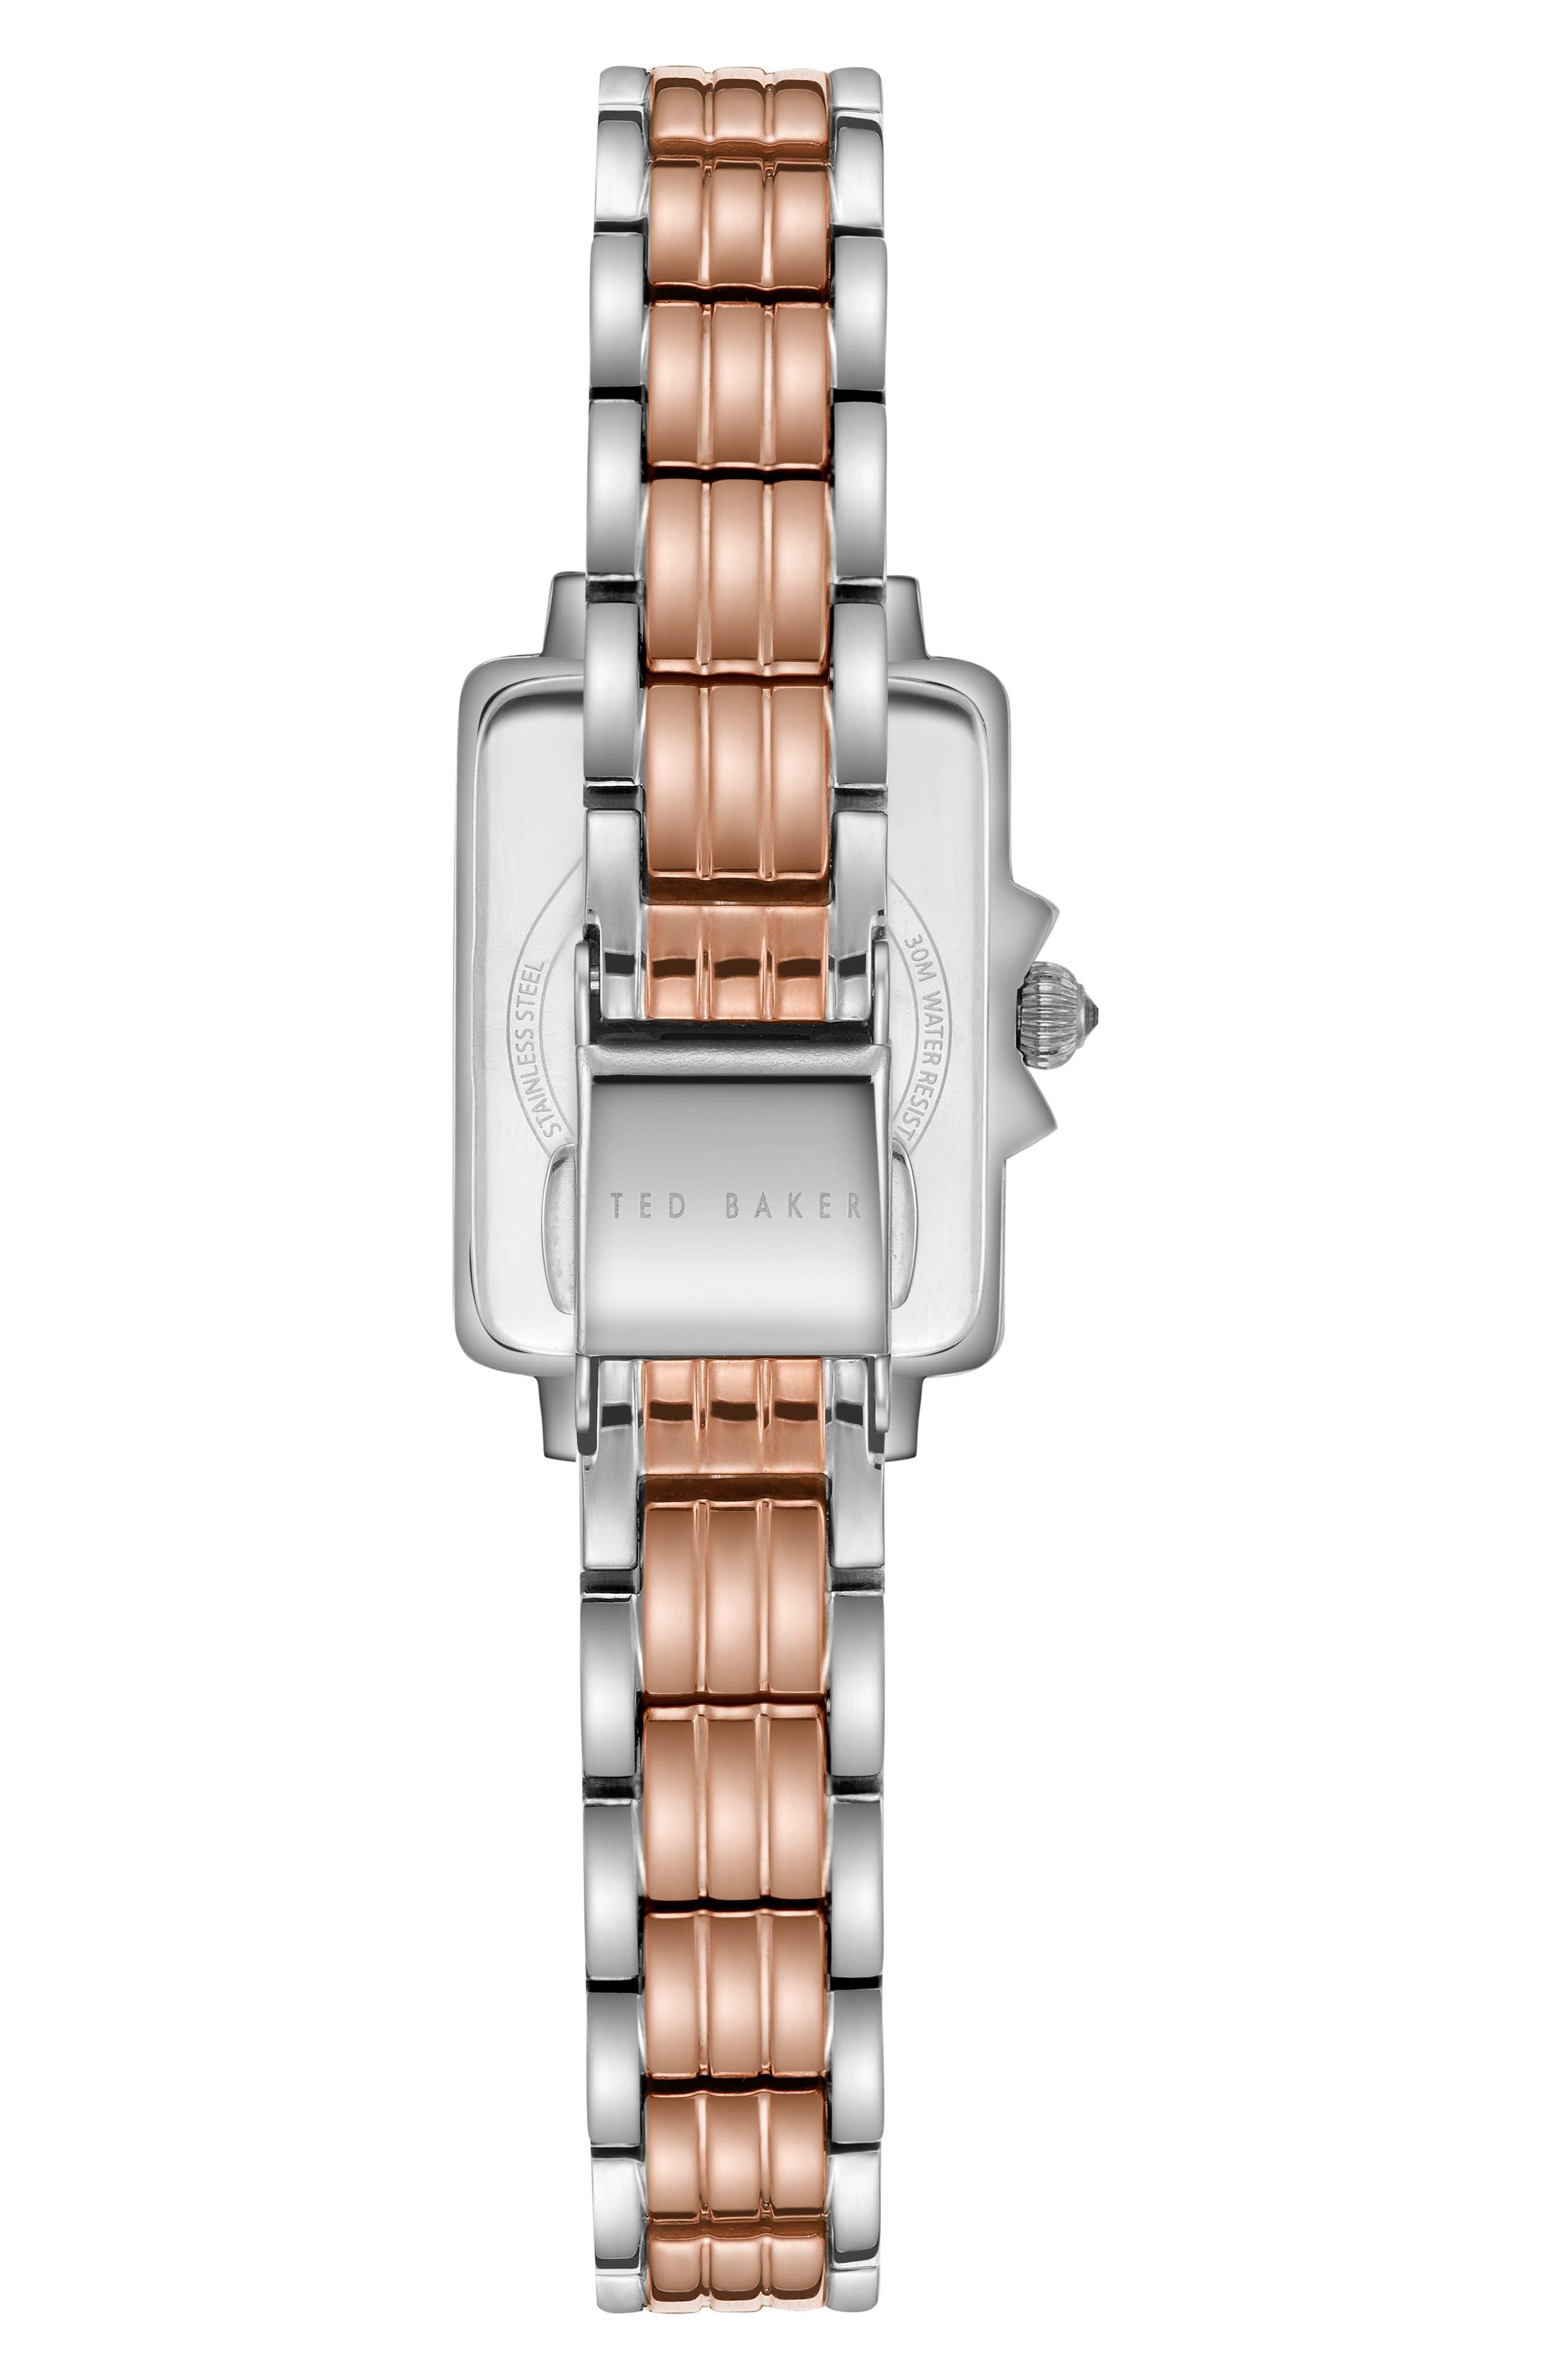 TED BAKER LONDON,                             Tess Bracelet Watch, 20mm,                             Alternate thumbnail 2, color,                             040